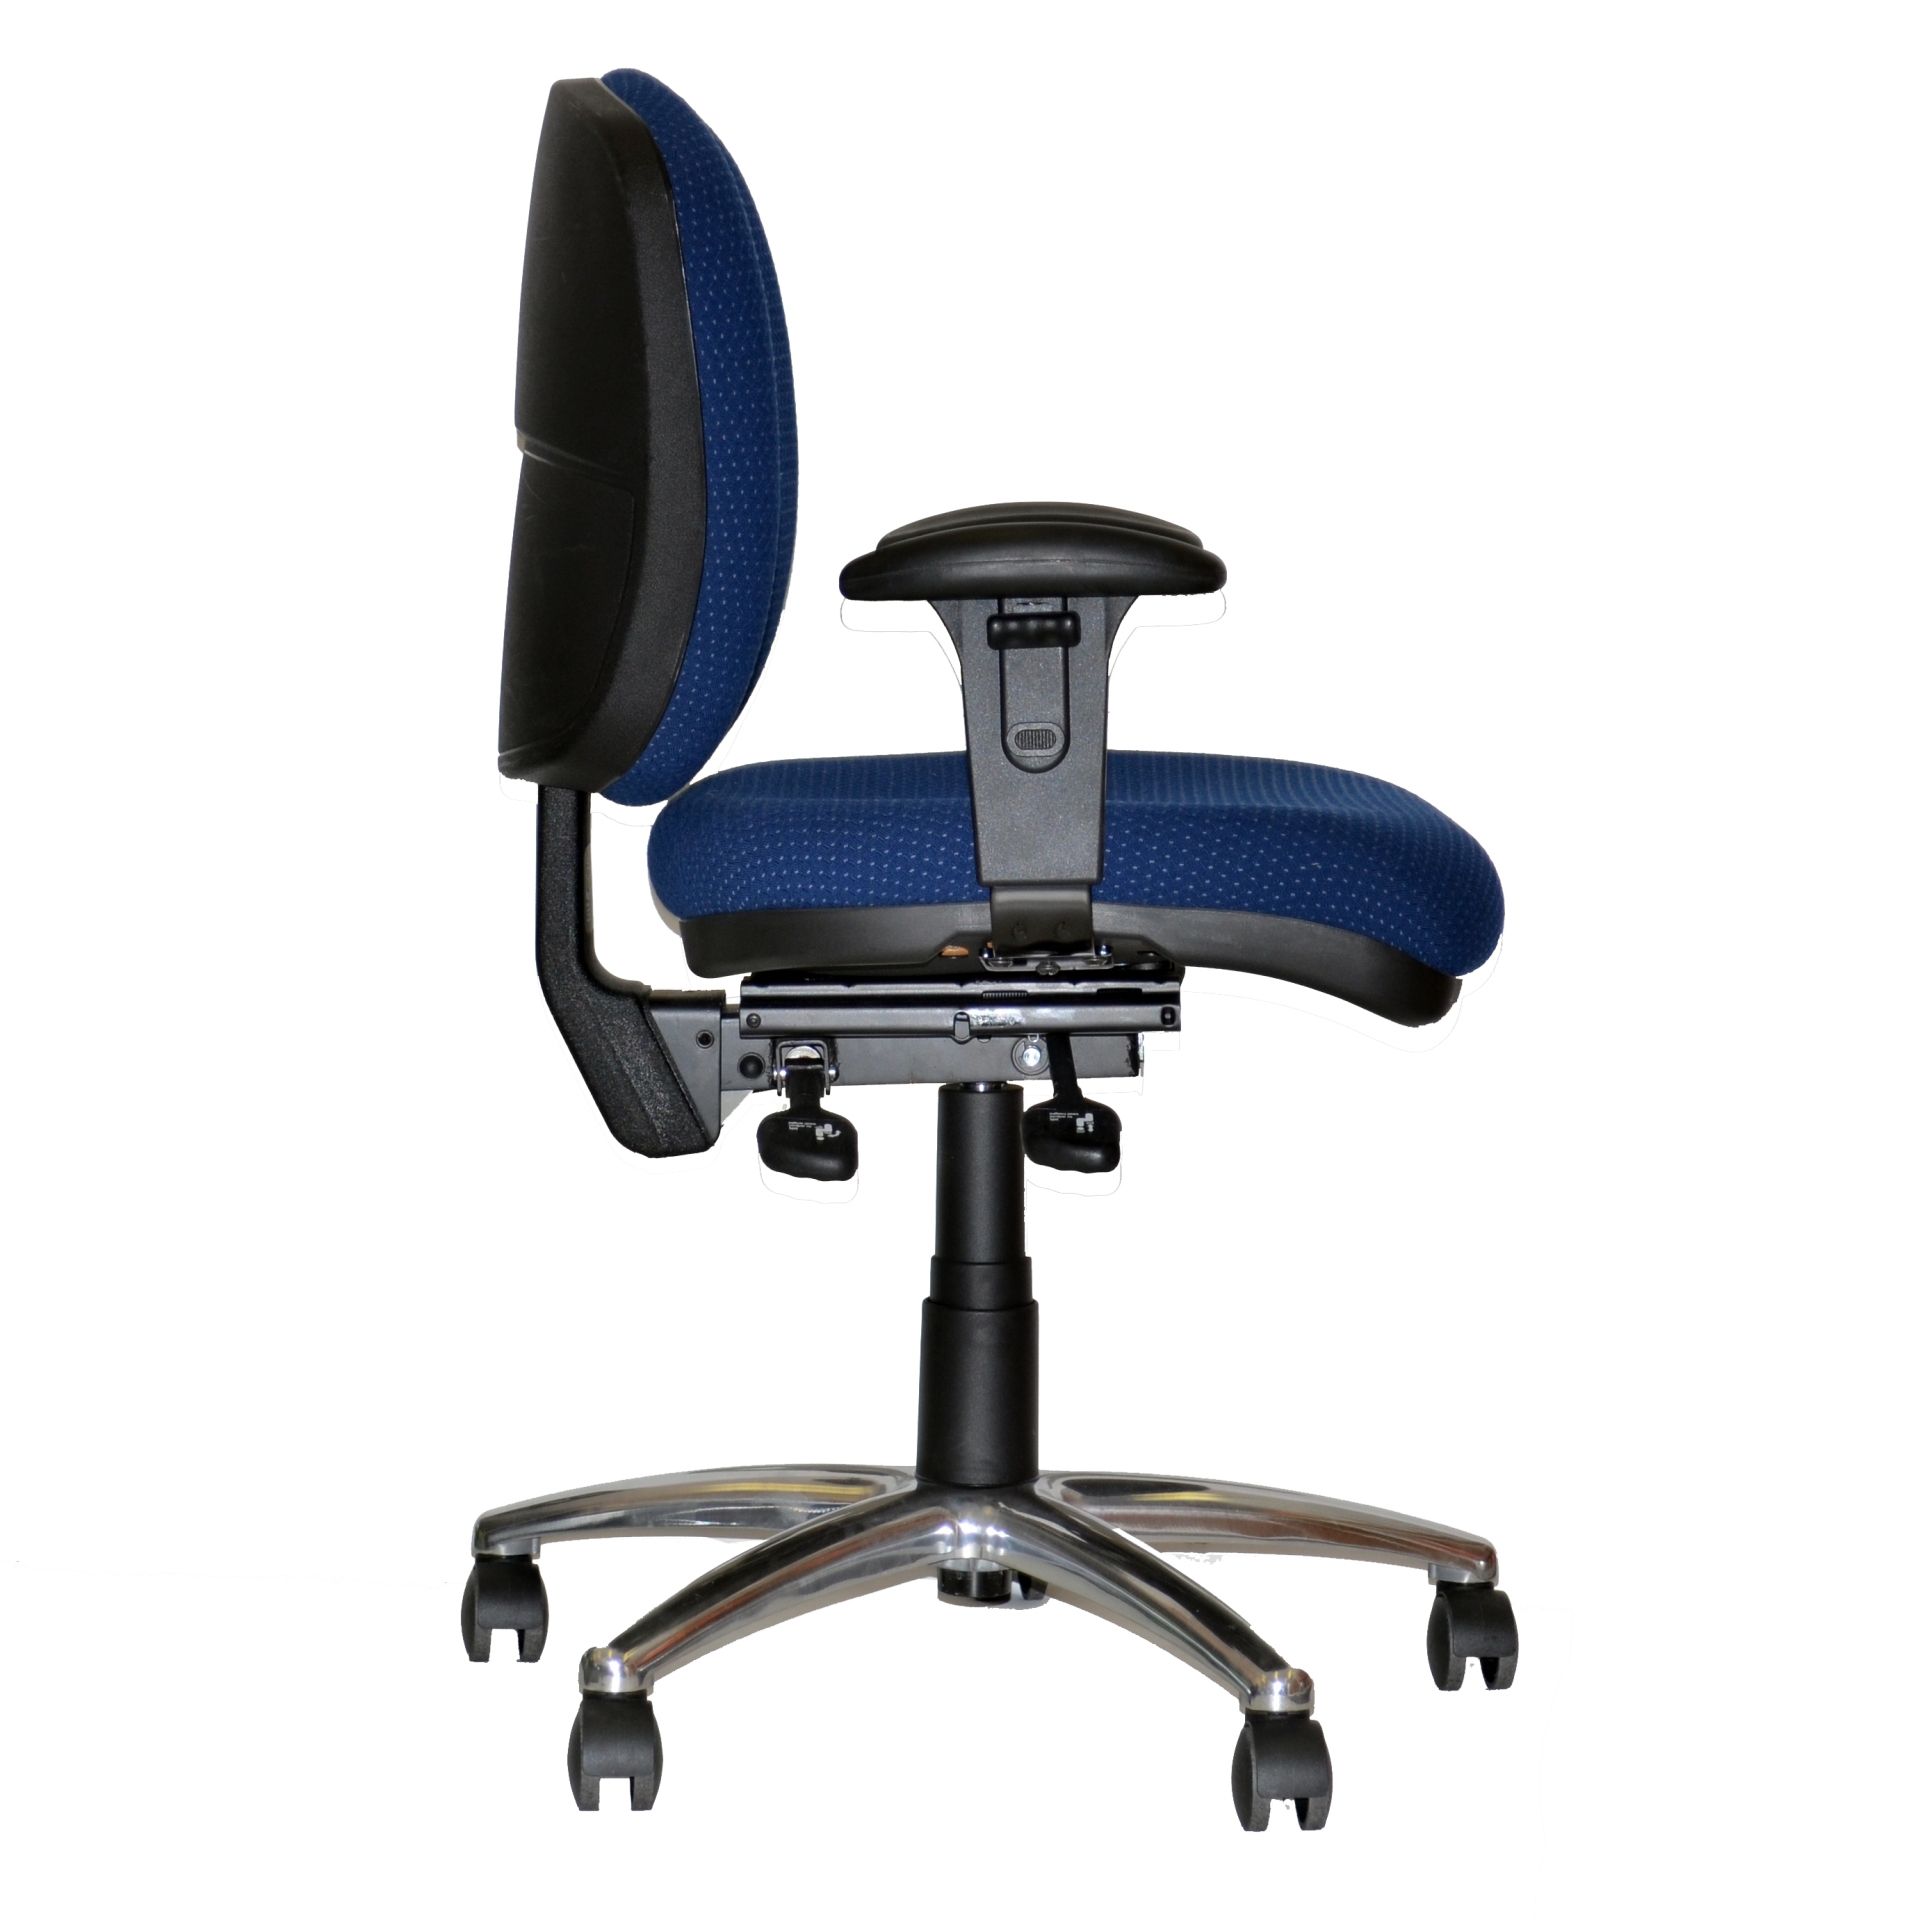 Direct Ergonomics | Sydney Office Furniture | Ergonomic Furniture | Ergonomic Seating | Executive and Task Seating | Ergonomic Chair | Ezone 510